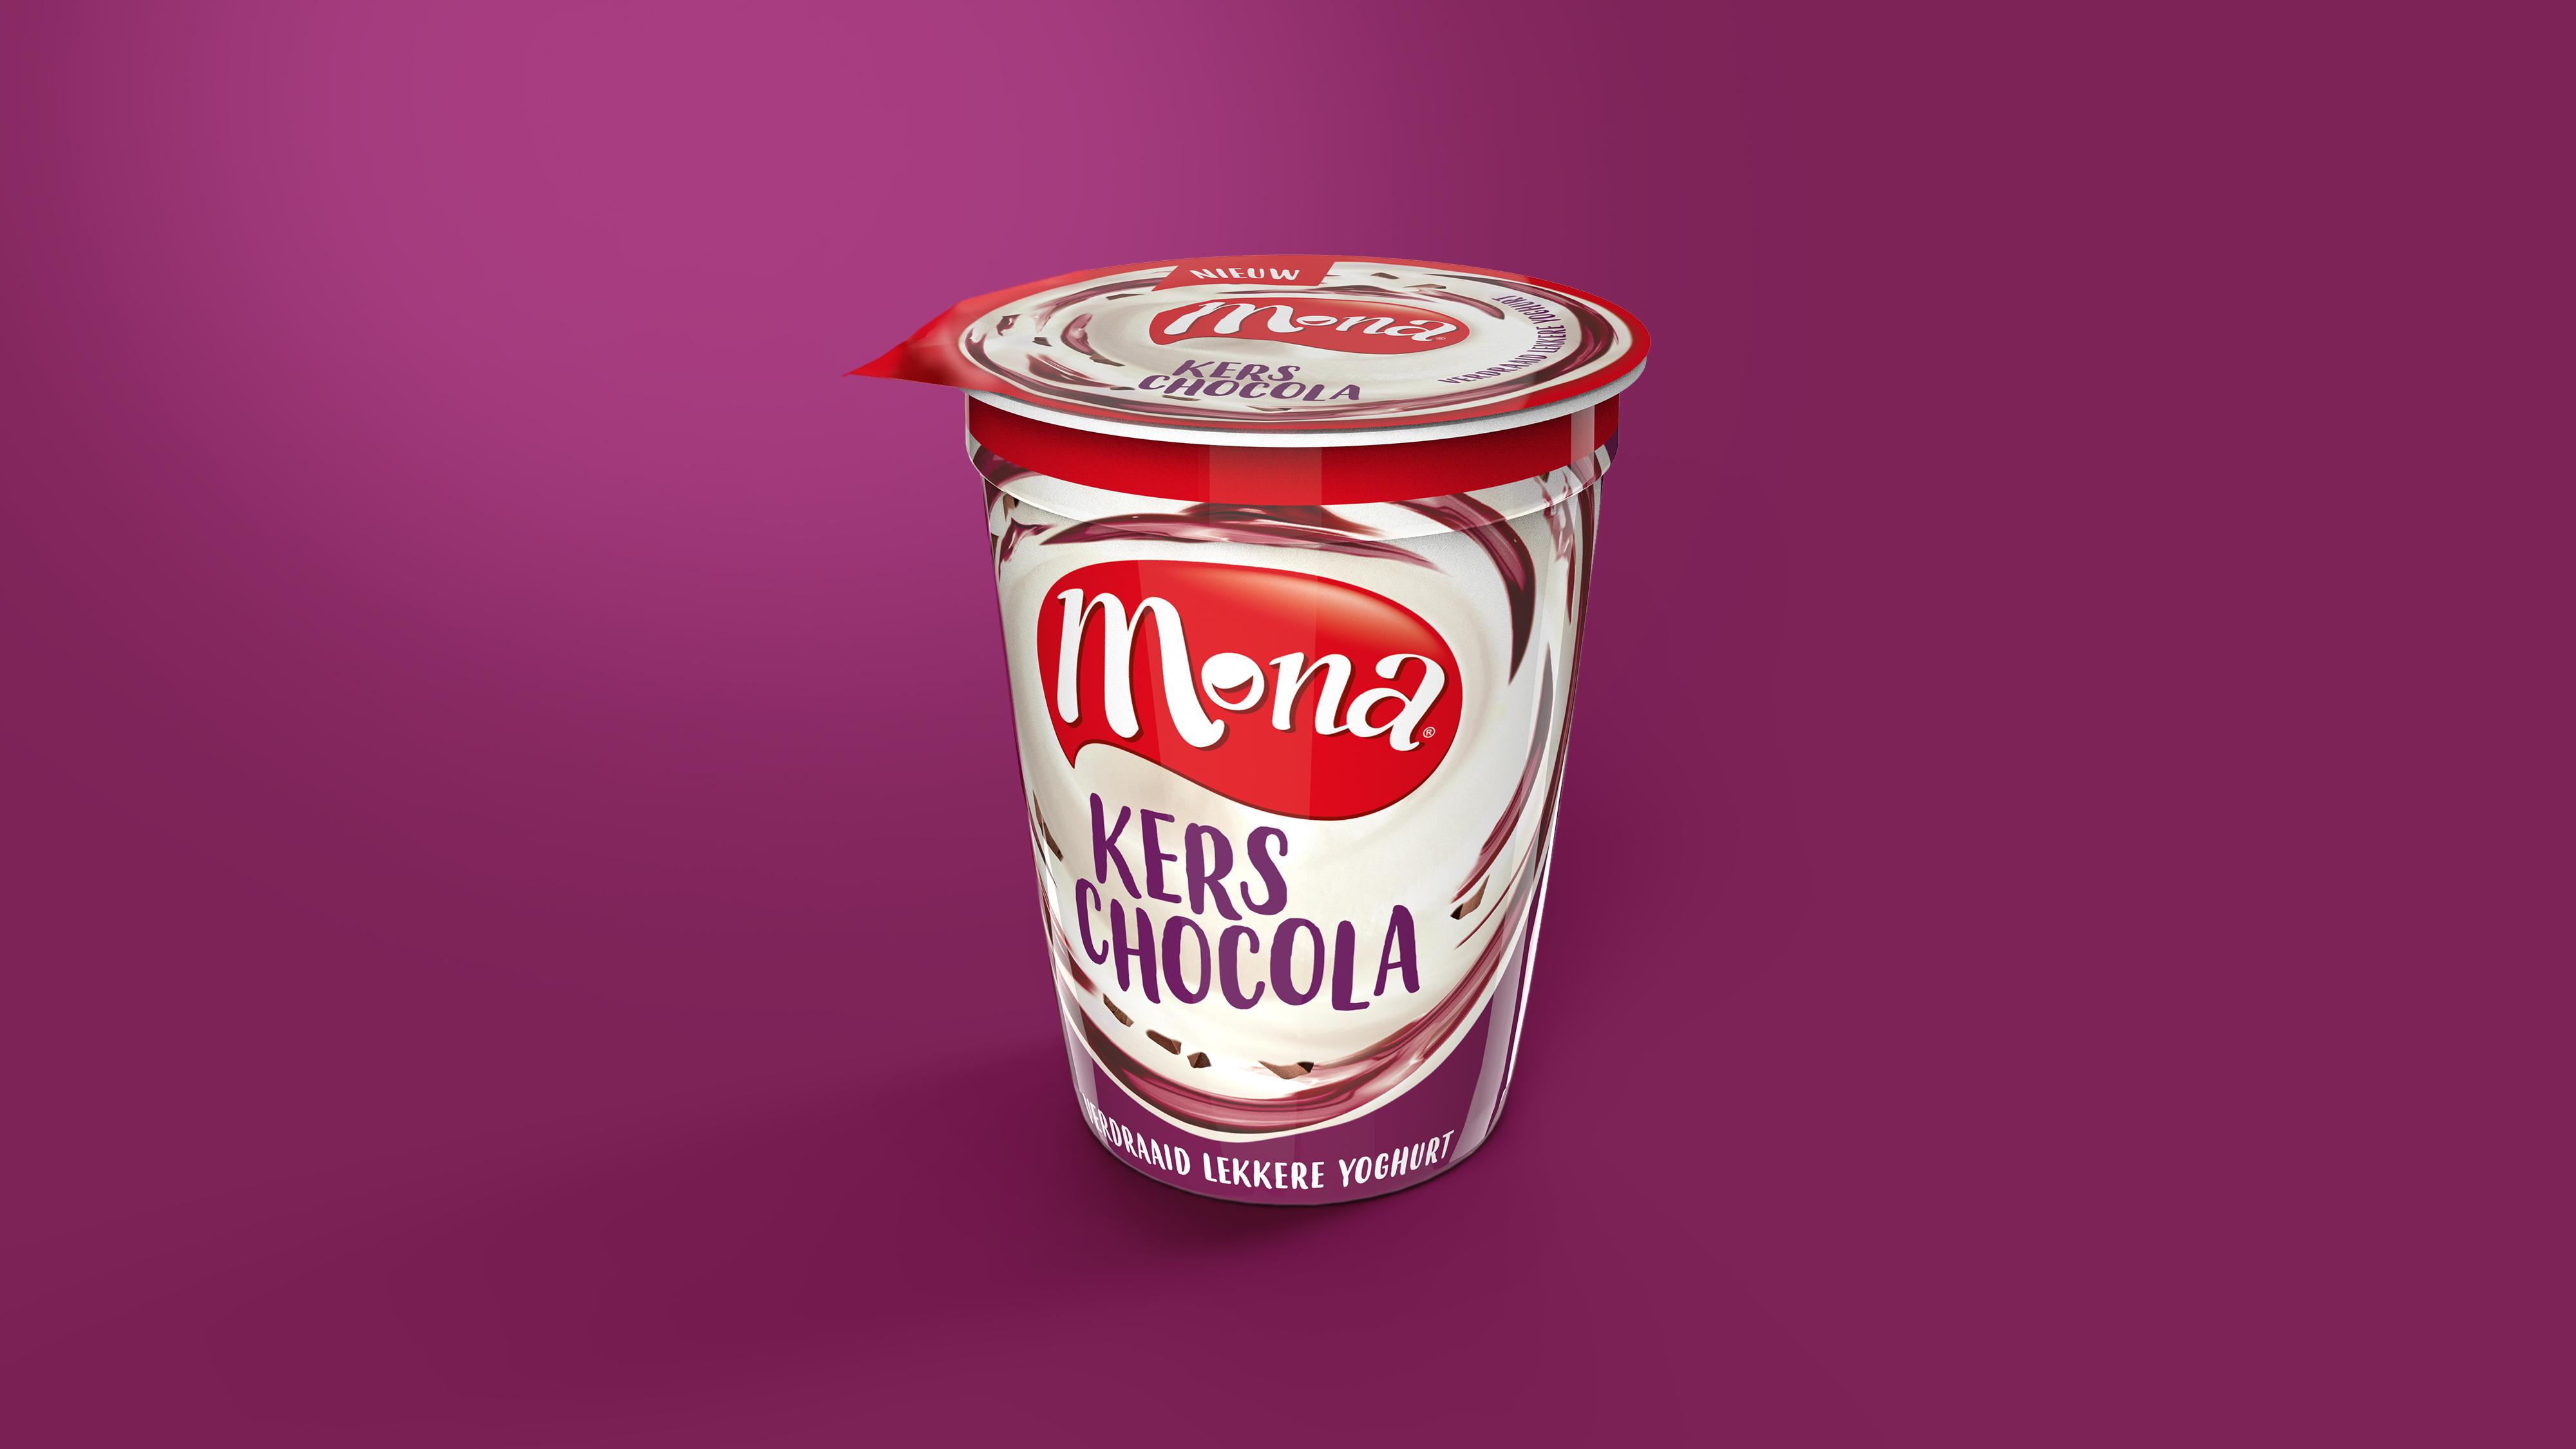 Mona yoghurt dessert packaging design